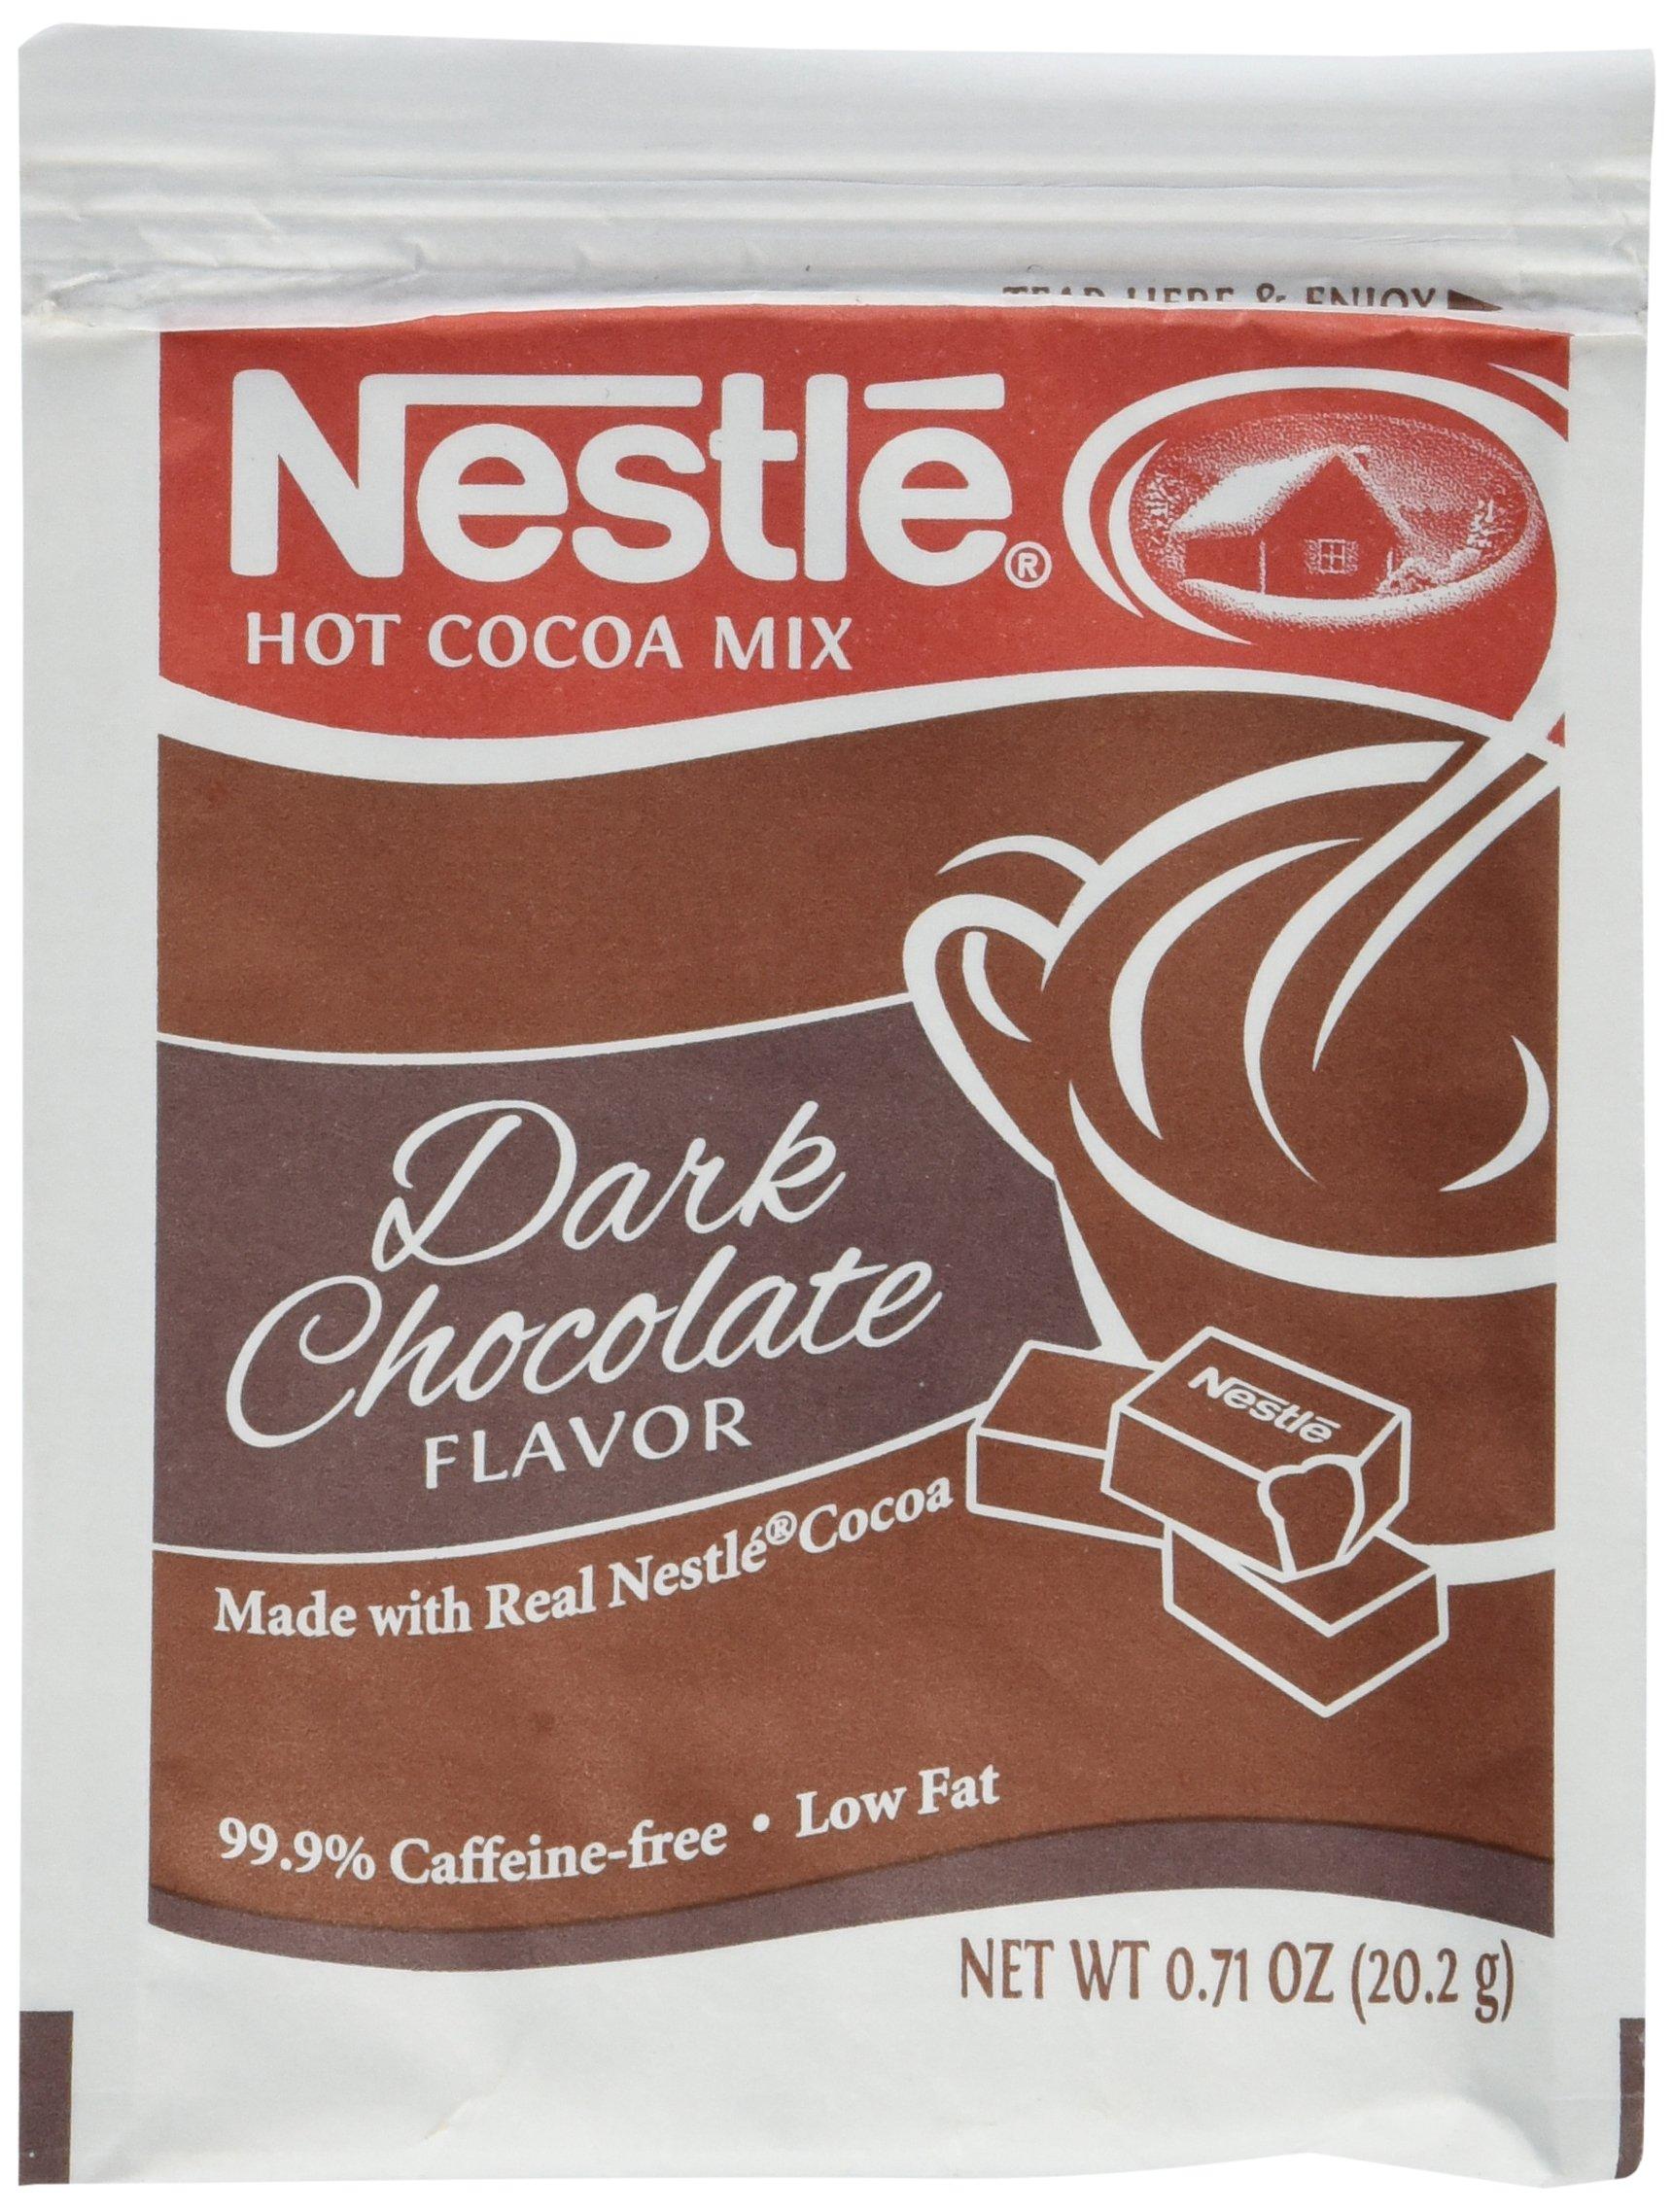 Nestle Hot Cocoa Mix - Dark Chocolate - 50 ct